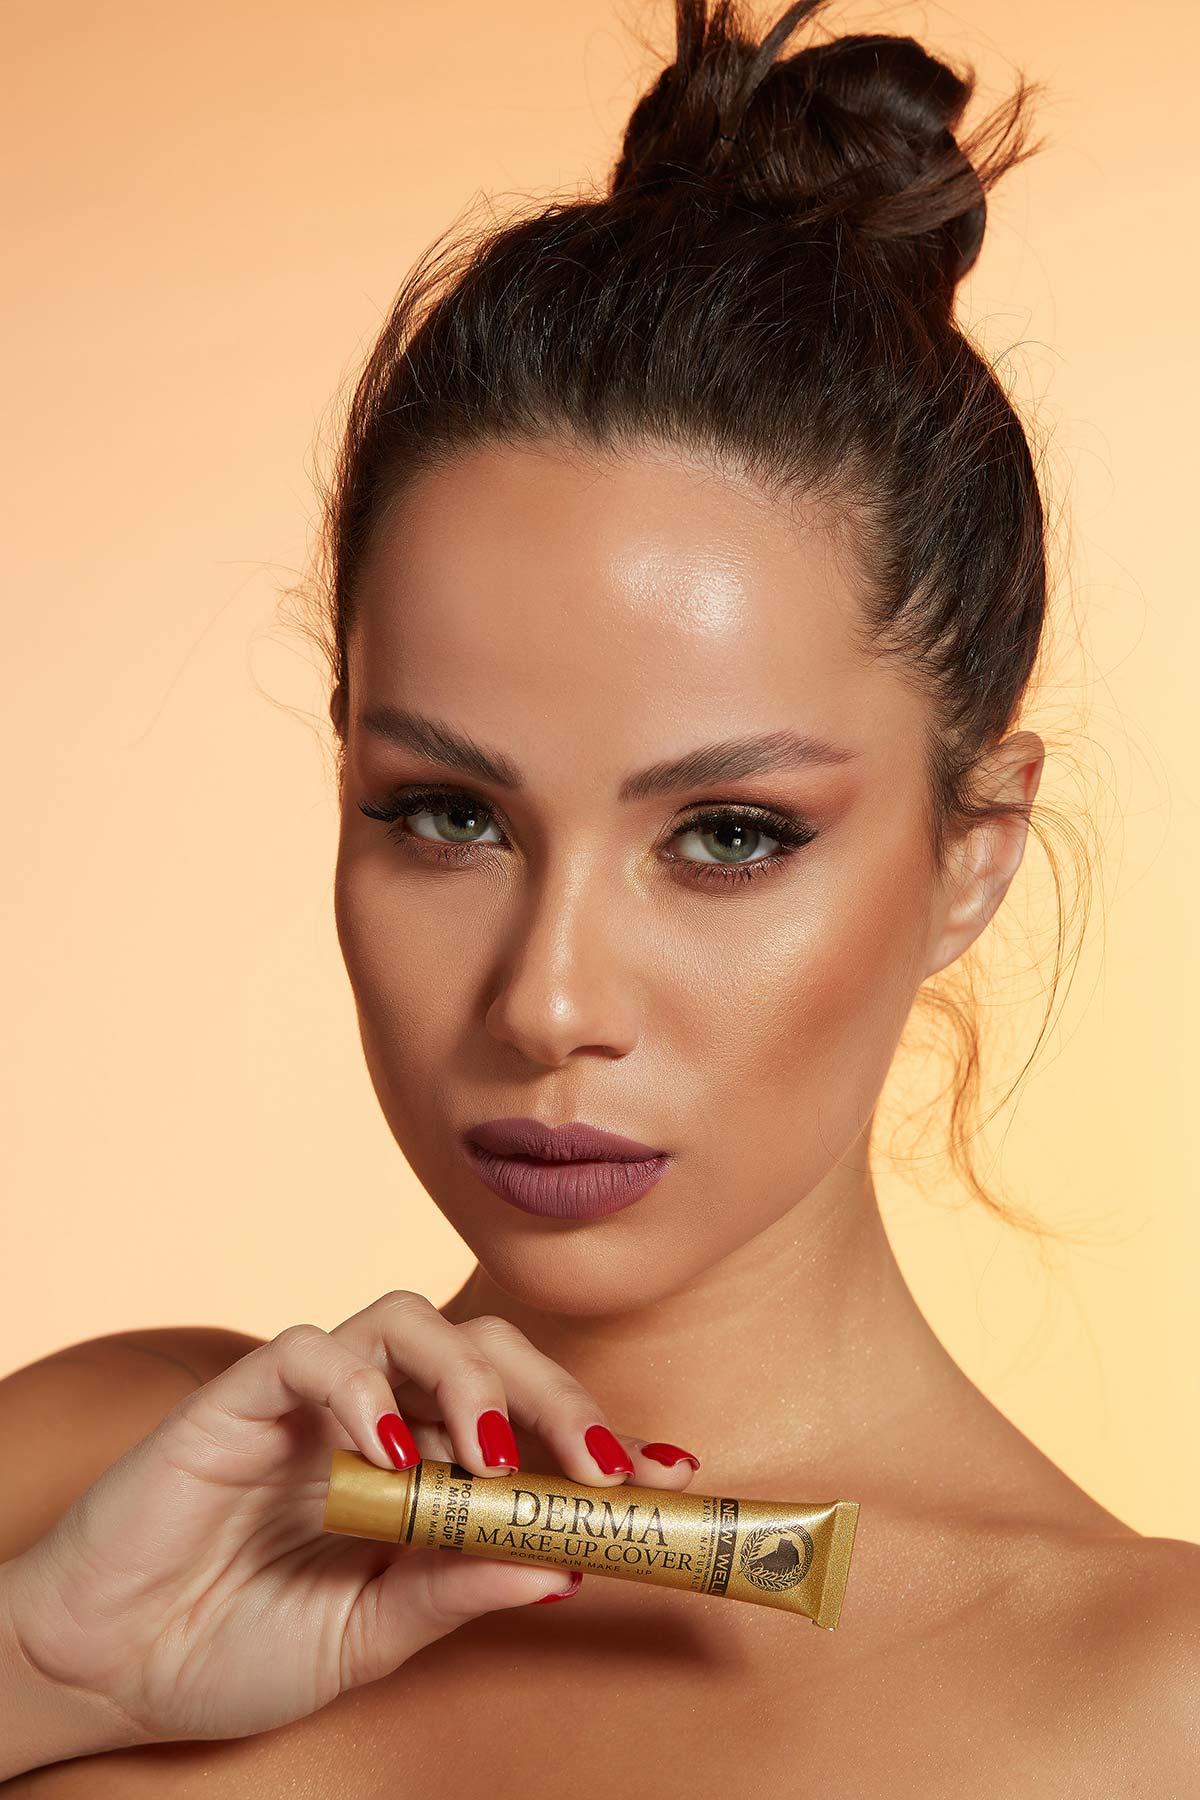 Derma Make-Up Cover Foundation - Silver -Foundation